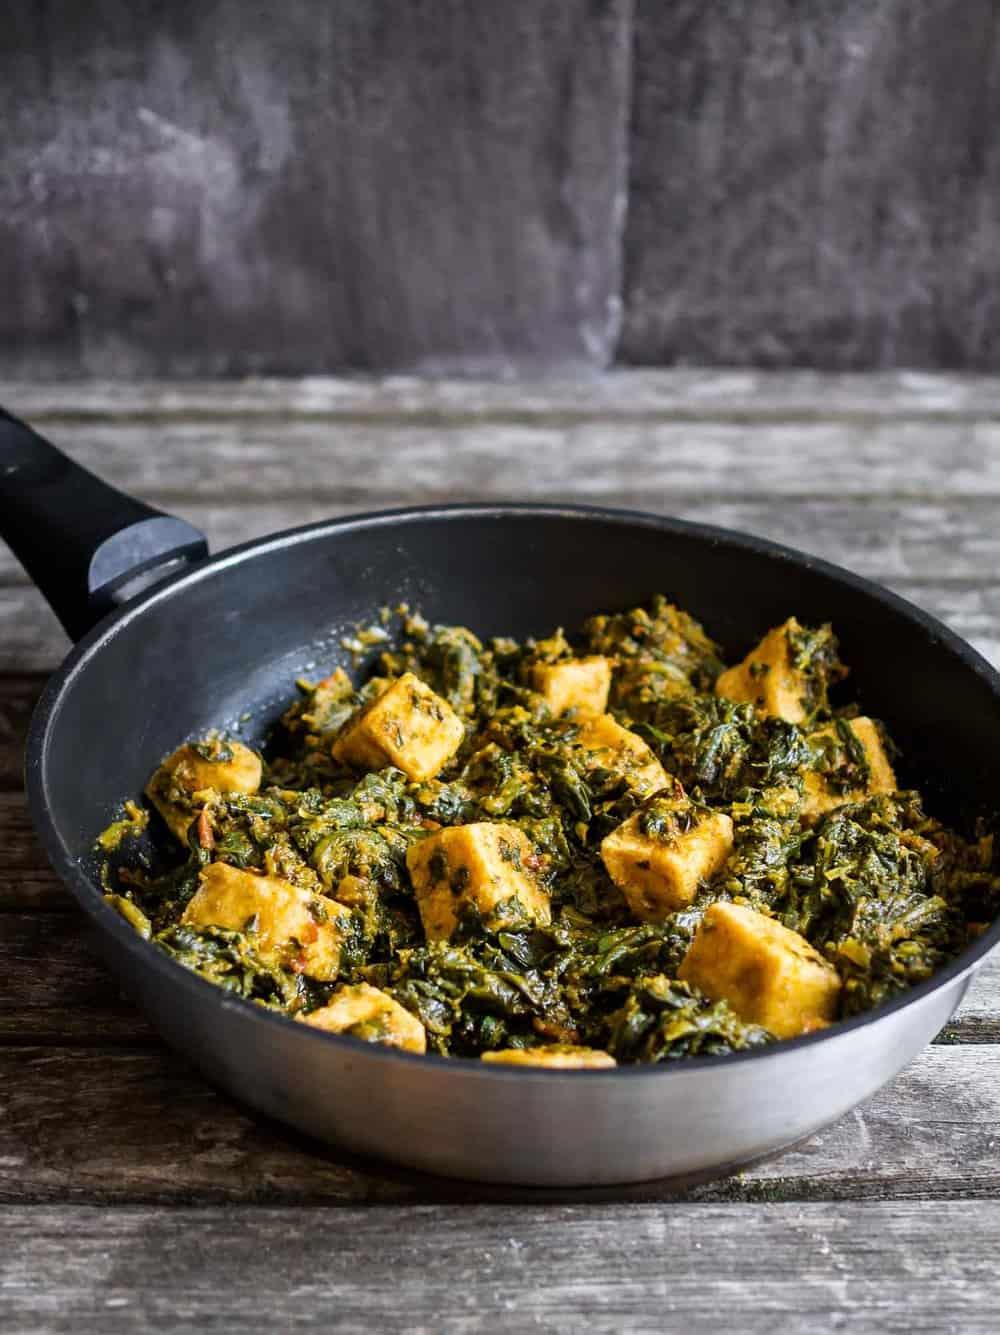 Saag tofu recipe